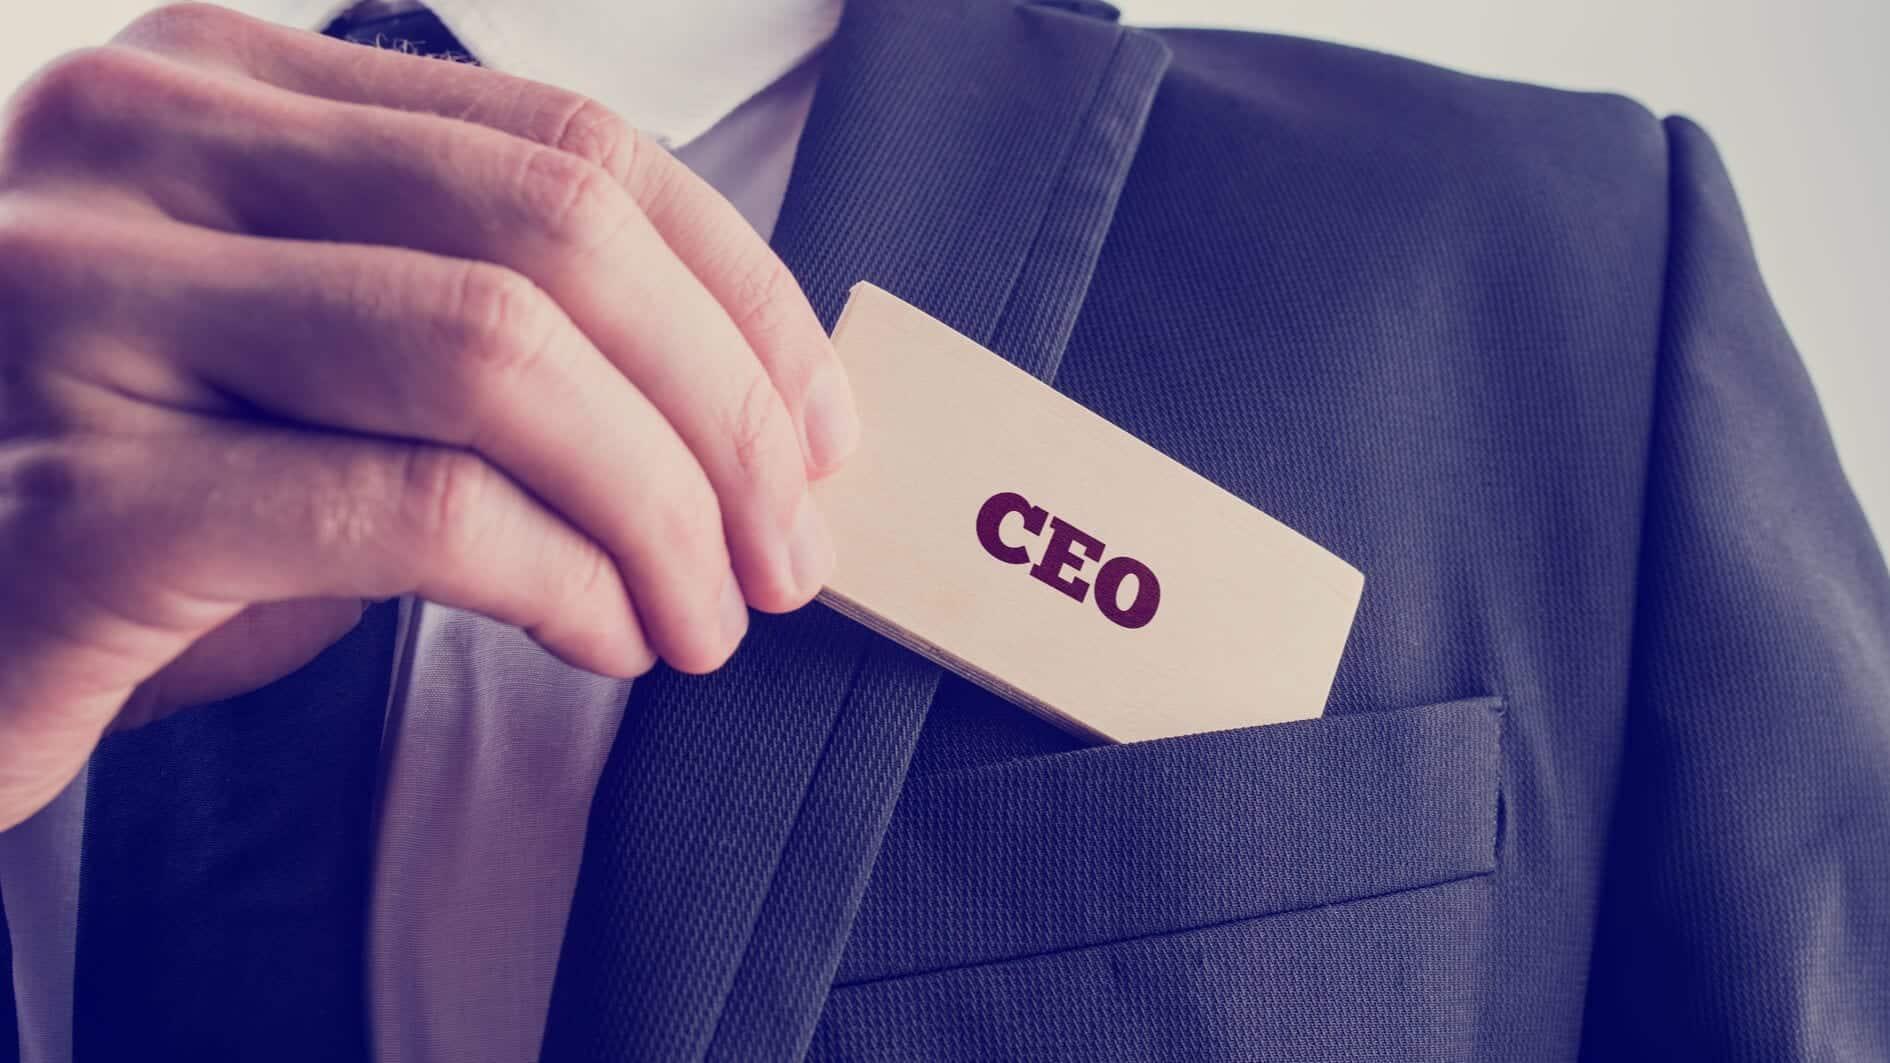 Ingin Menjadi CEO? Begini Caranya Menurut LinkedIn